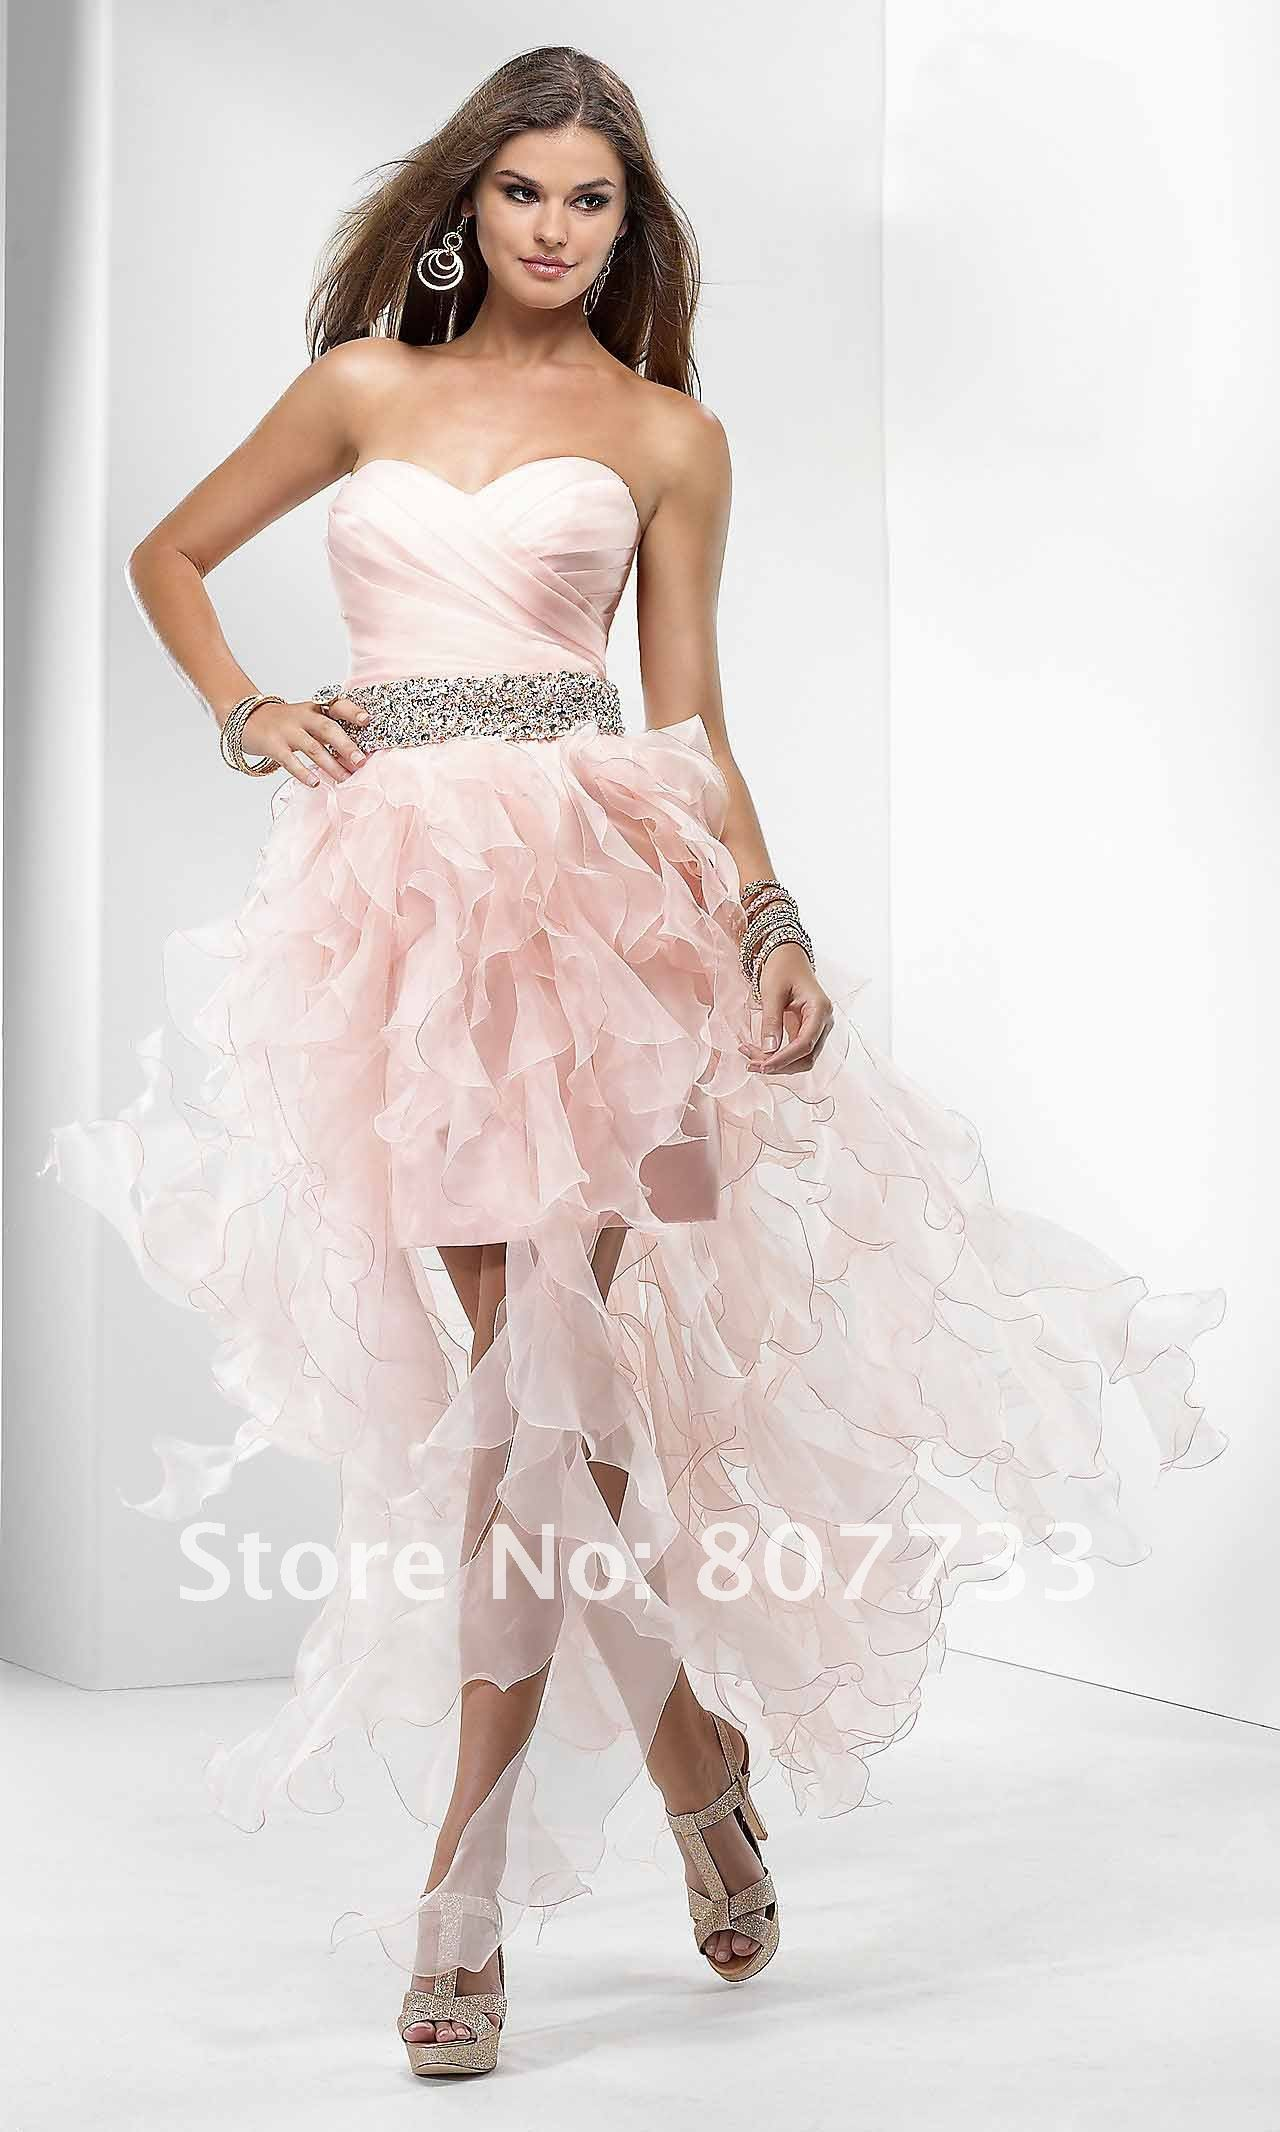 Xoxo Prom Dresses  Cocktail Dresses 2016